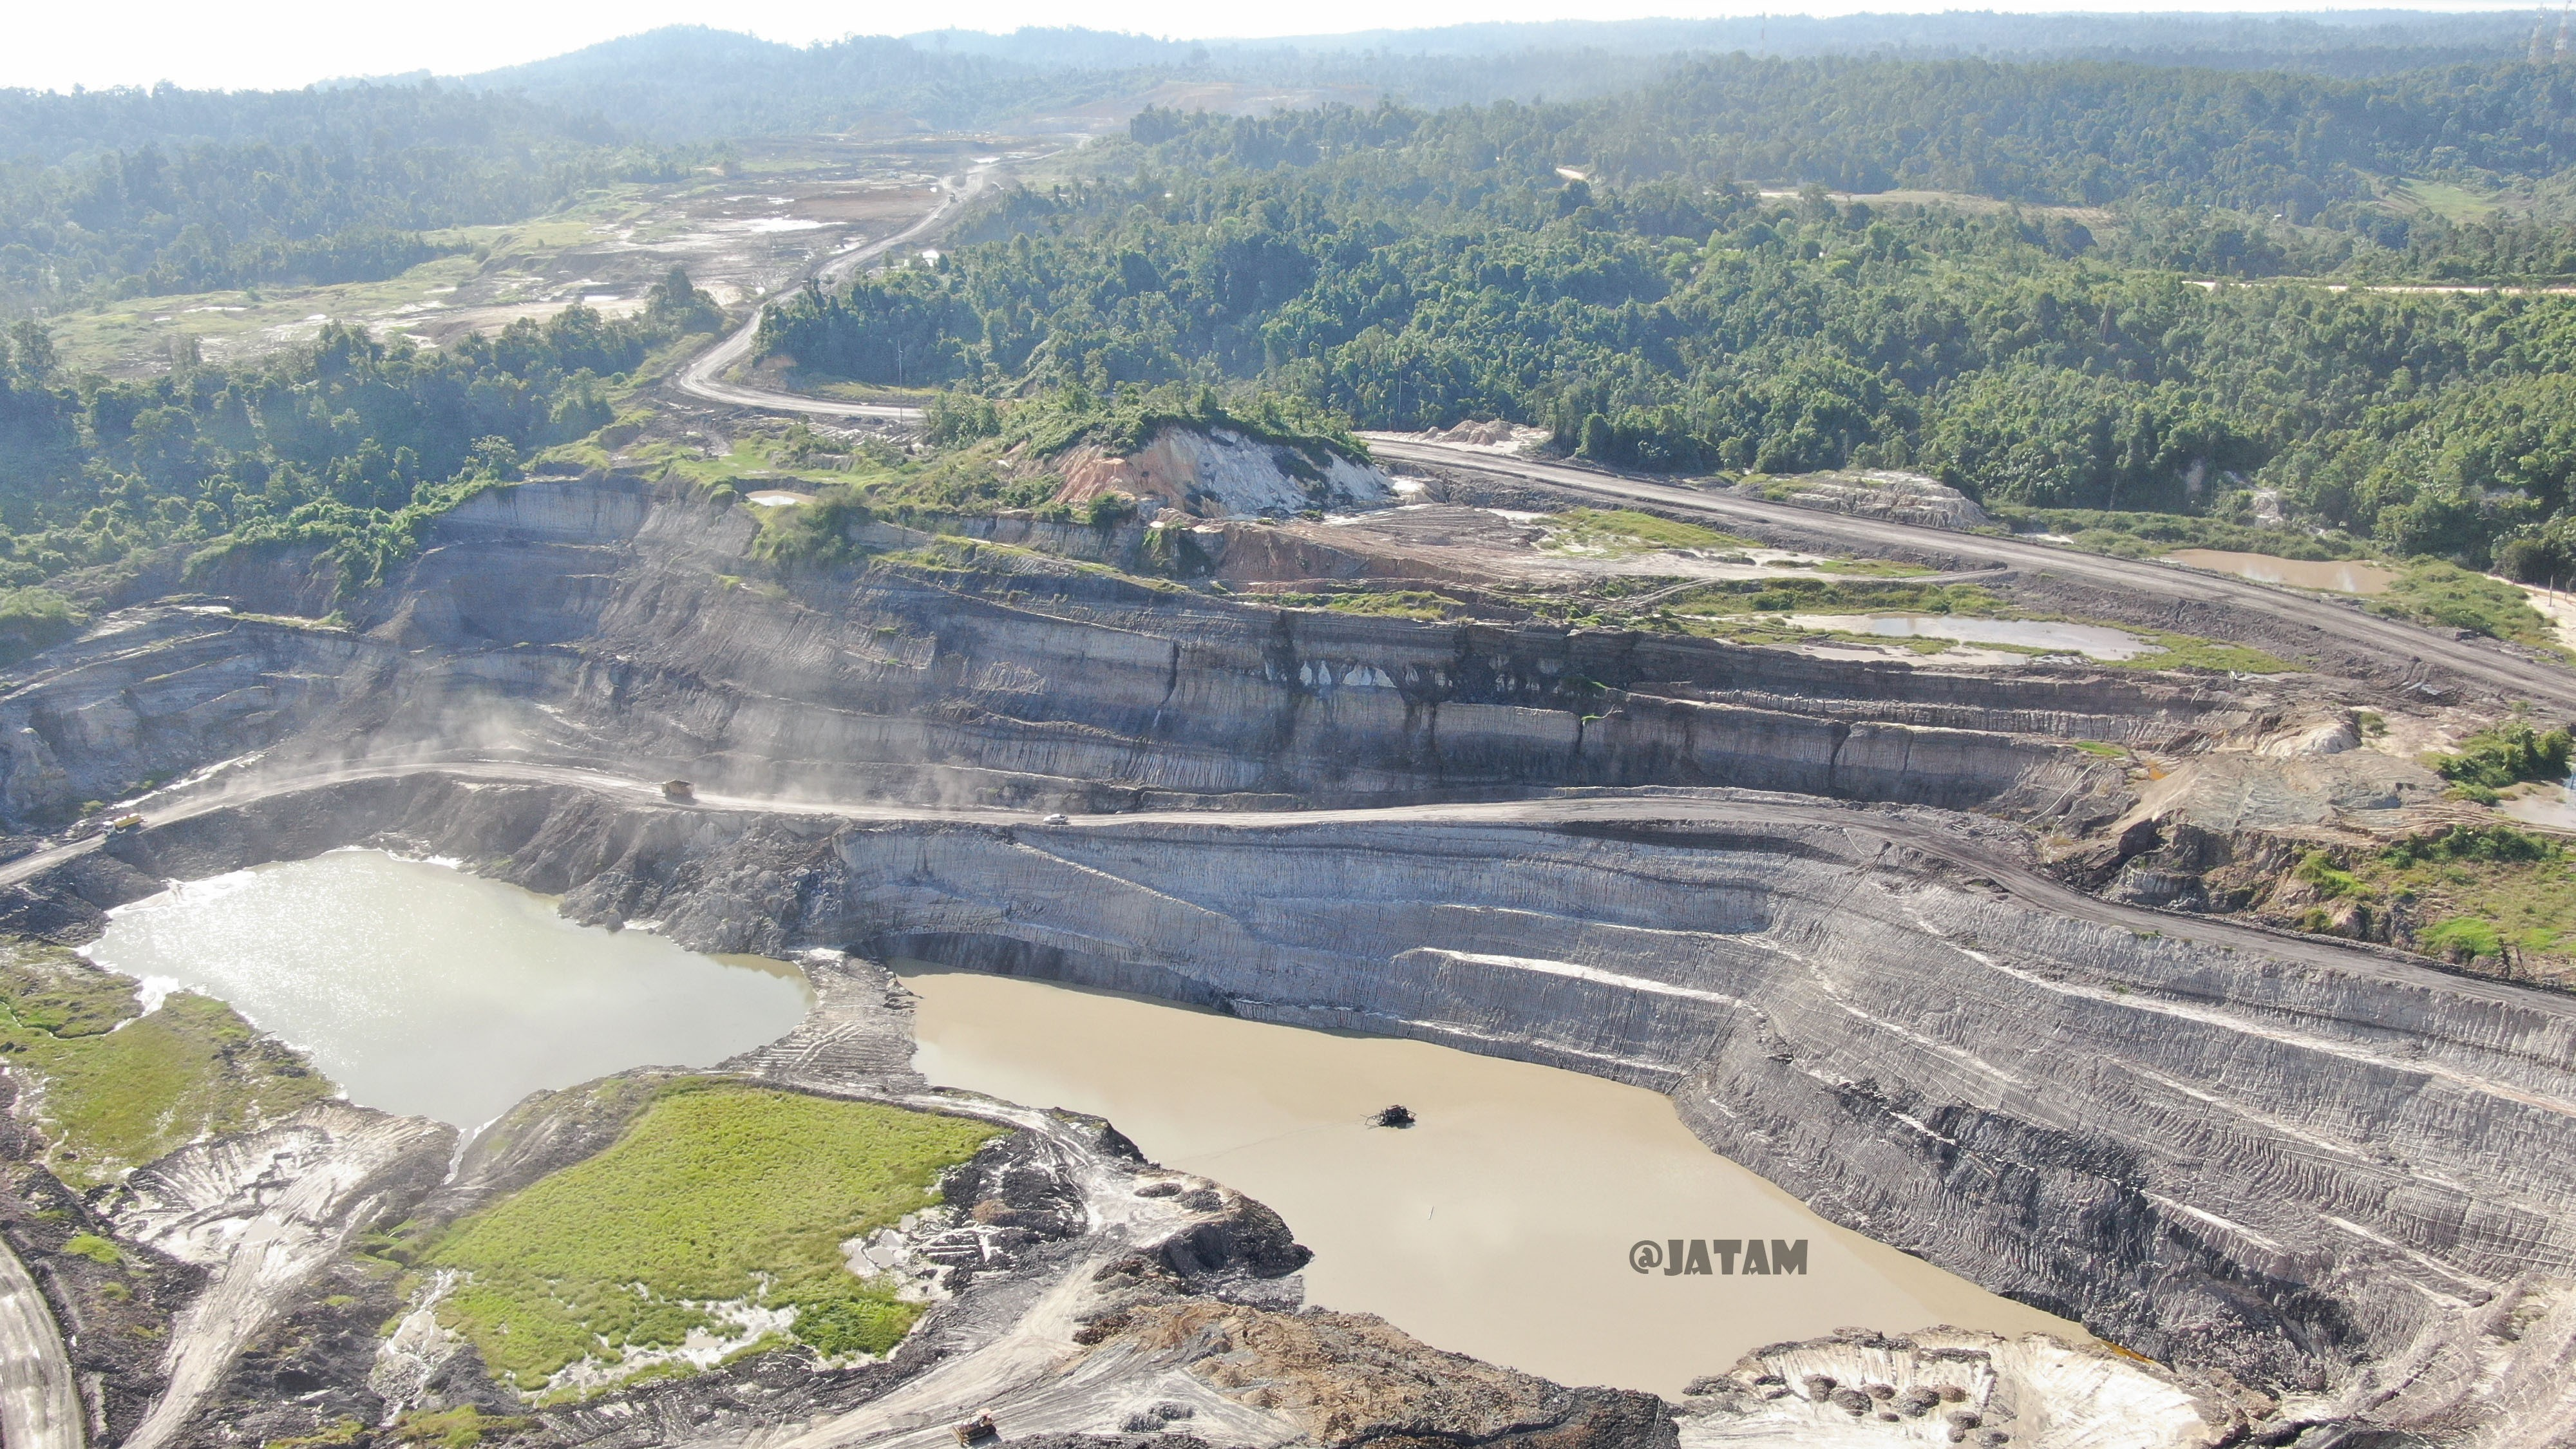 A huge mine on a small island - Adani's coal mine on Bunyu, North Kalimantan. Photo JATAM